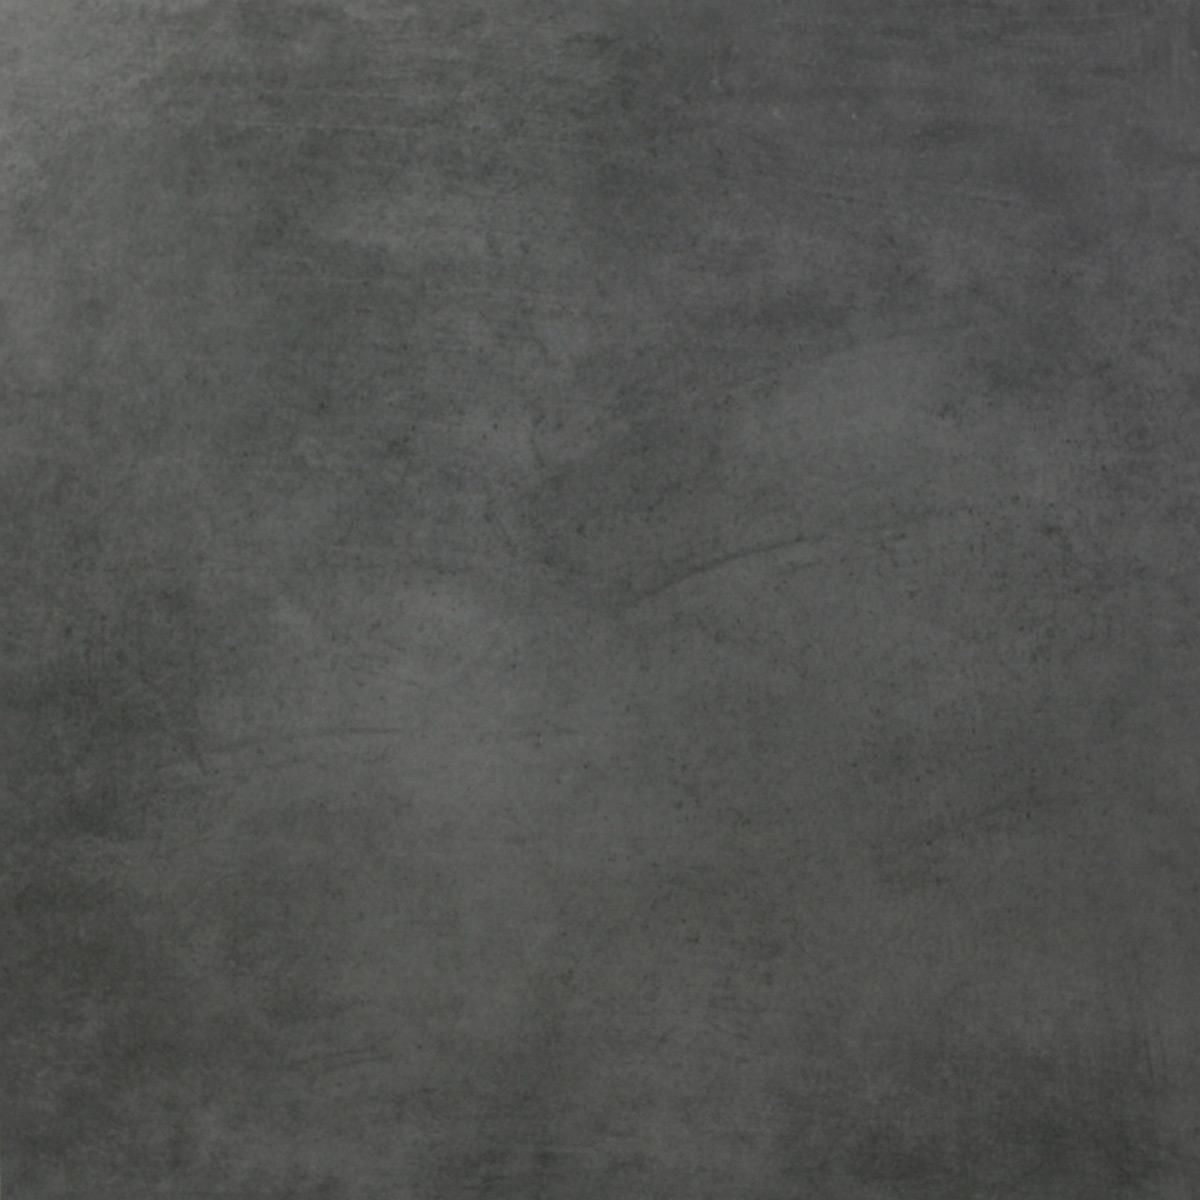 Cinque Colonia Boden-/Wandfliese anthrazit 60x60